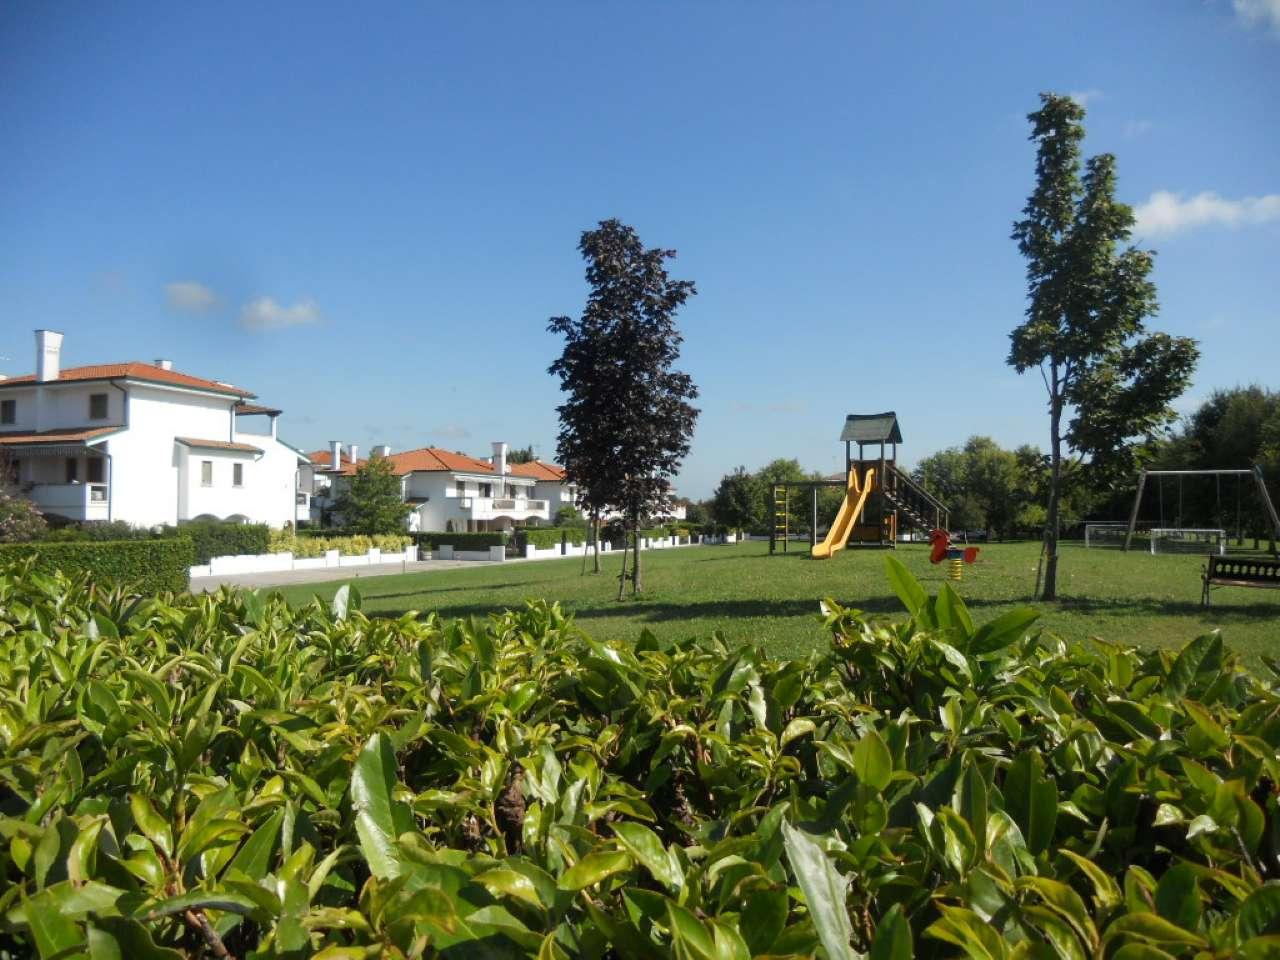 Villetta, Via Umago, Caorle, foto 16